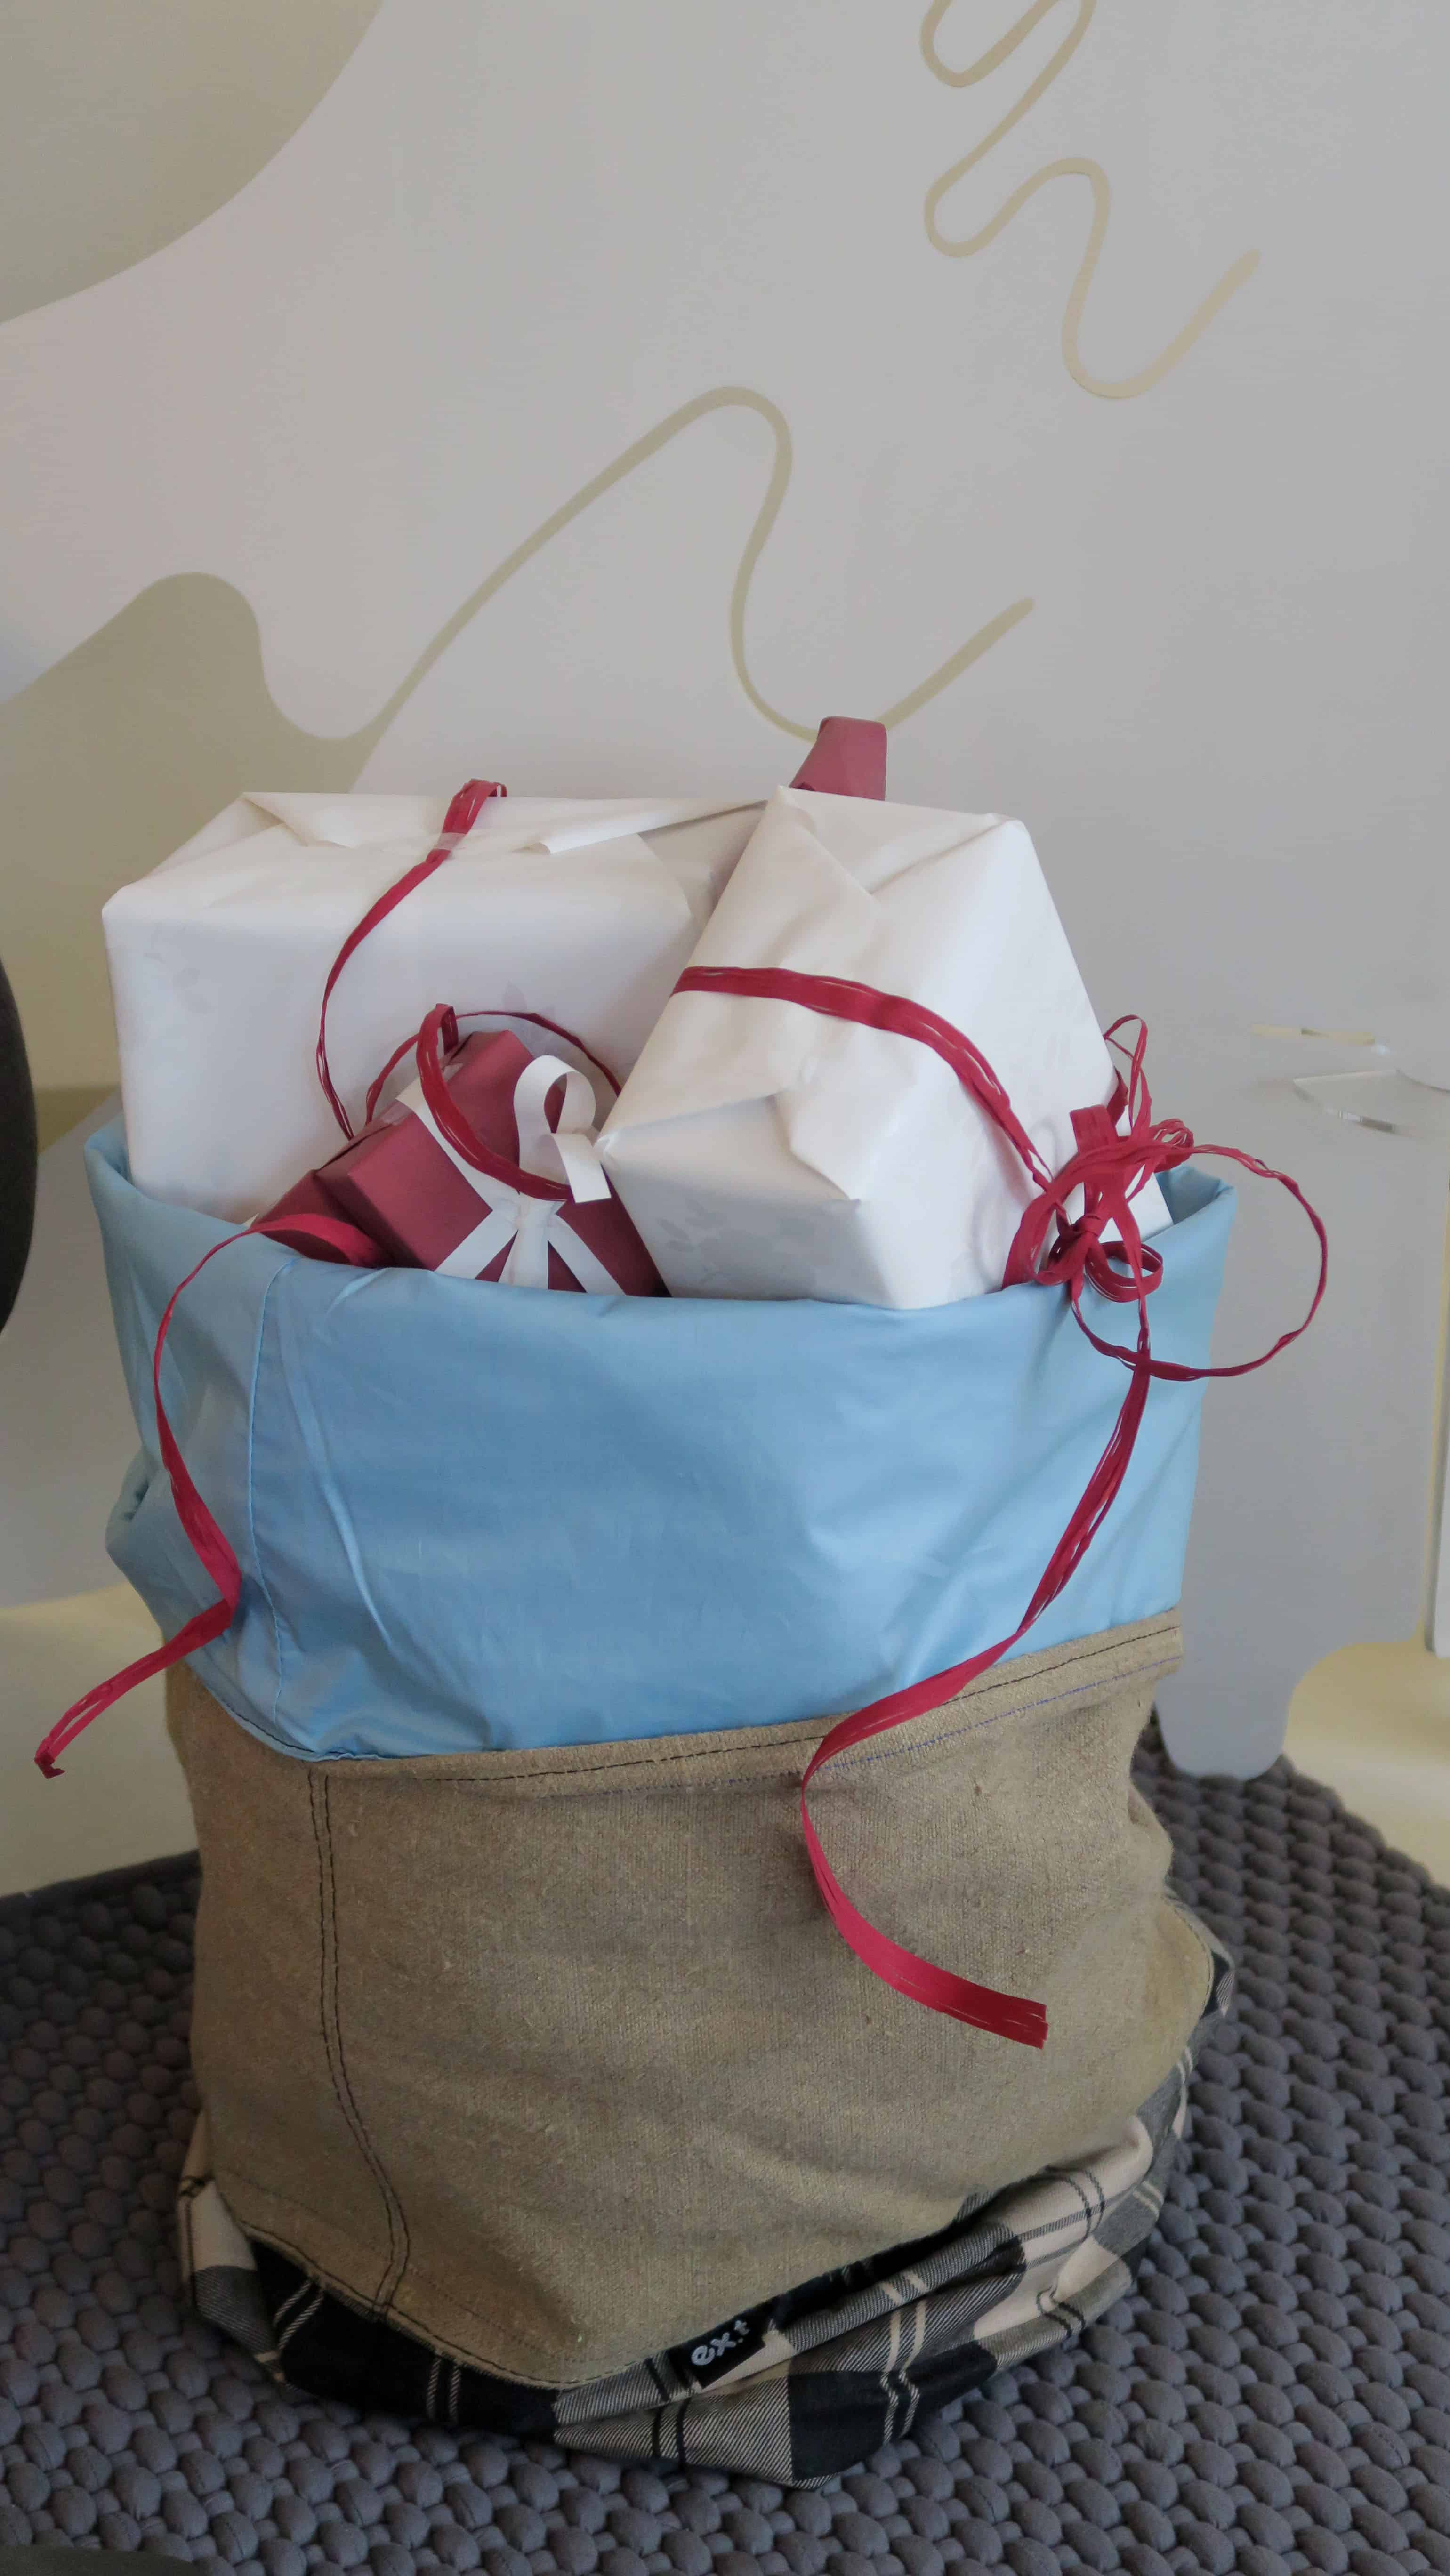 sacco-regali5